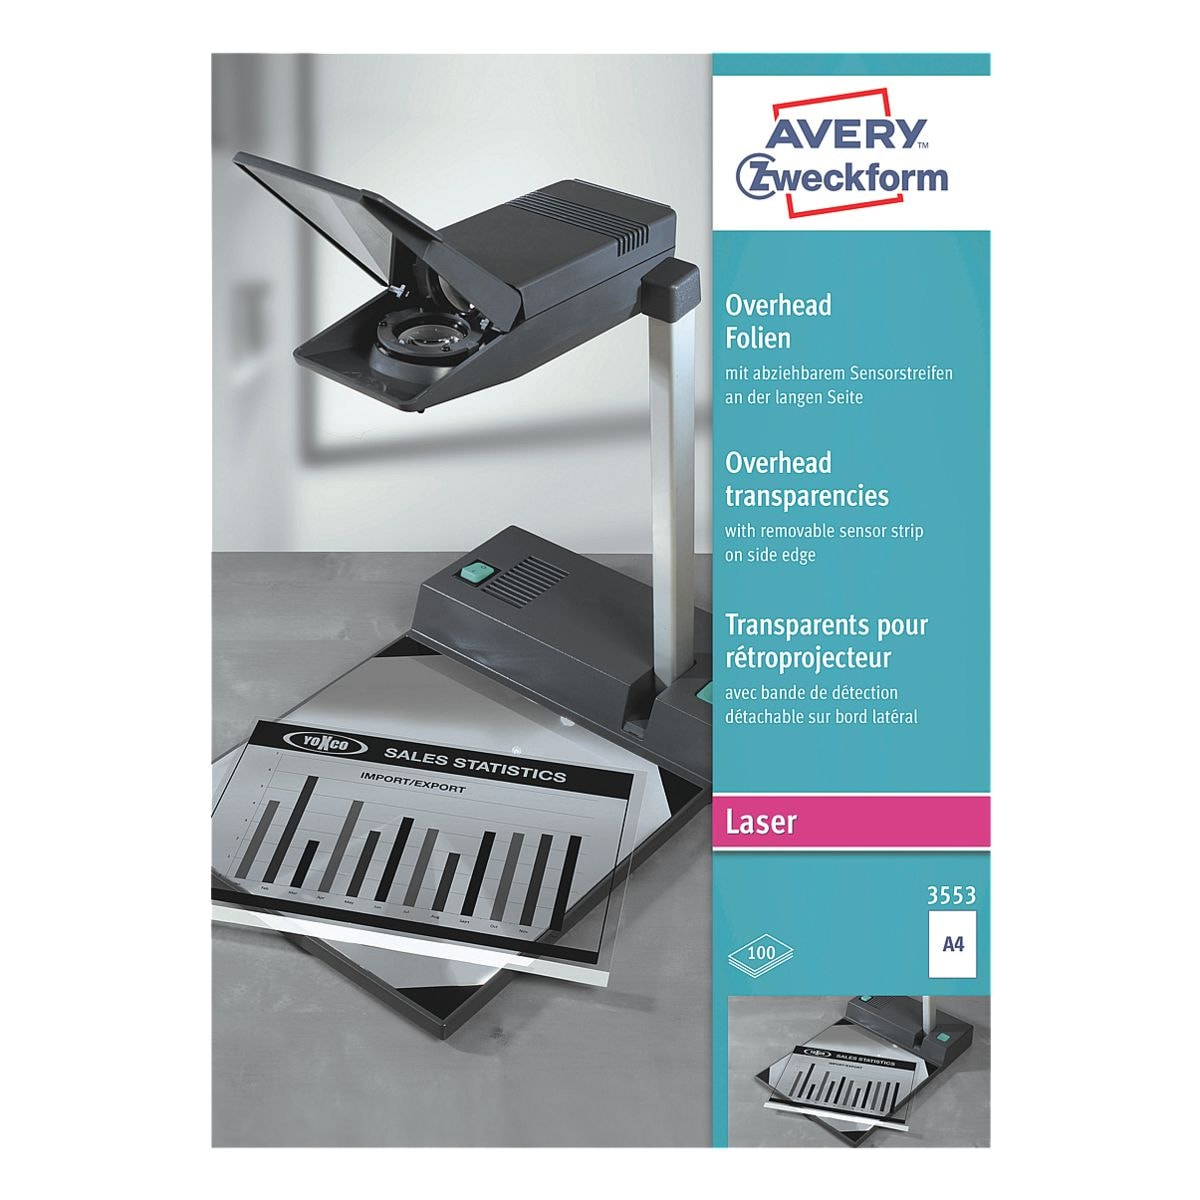 Avery Zweckform Overhead-S/W-Laserfolien »Sensorstreifen lang«